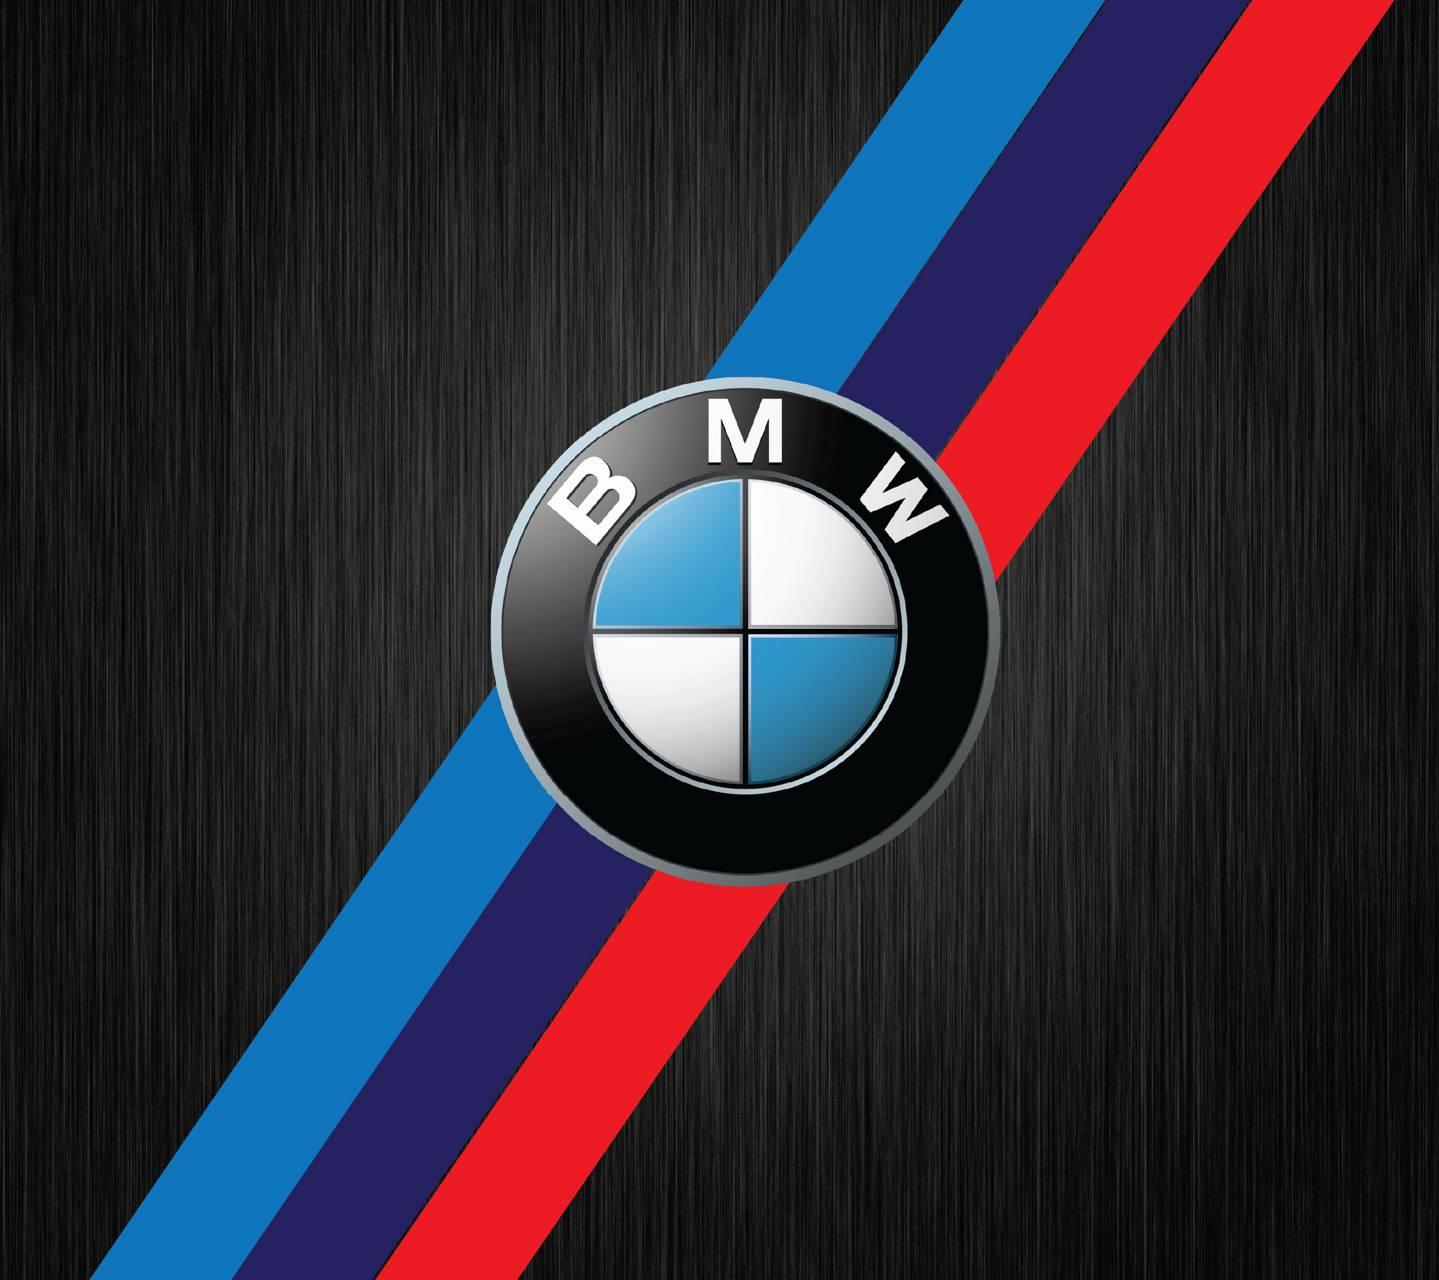 BMW M Series wallpaper by jamesluce2 - 83 - Free on ZEDGE™